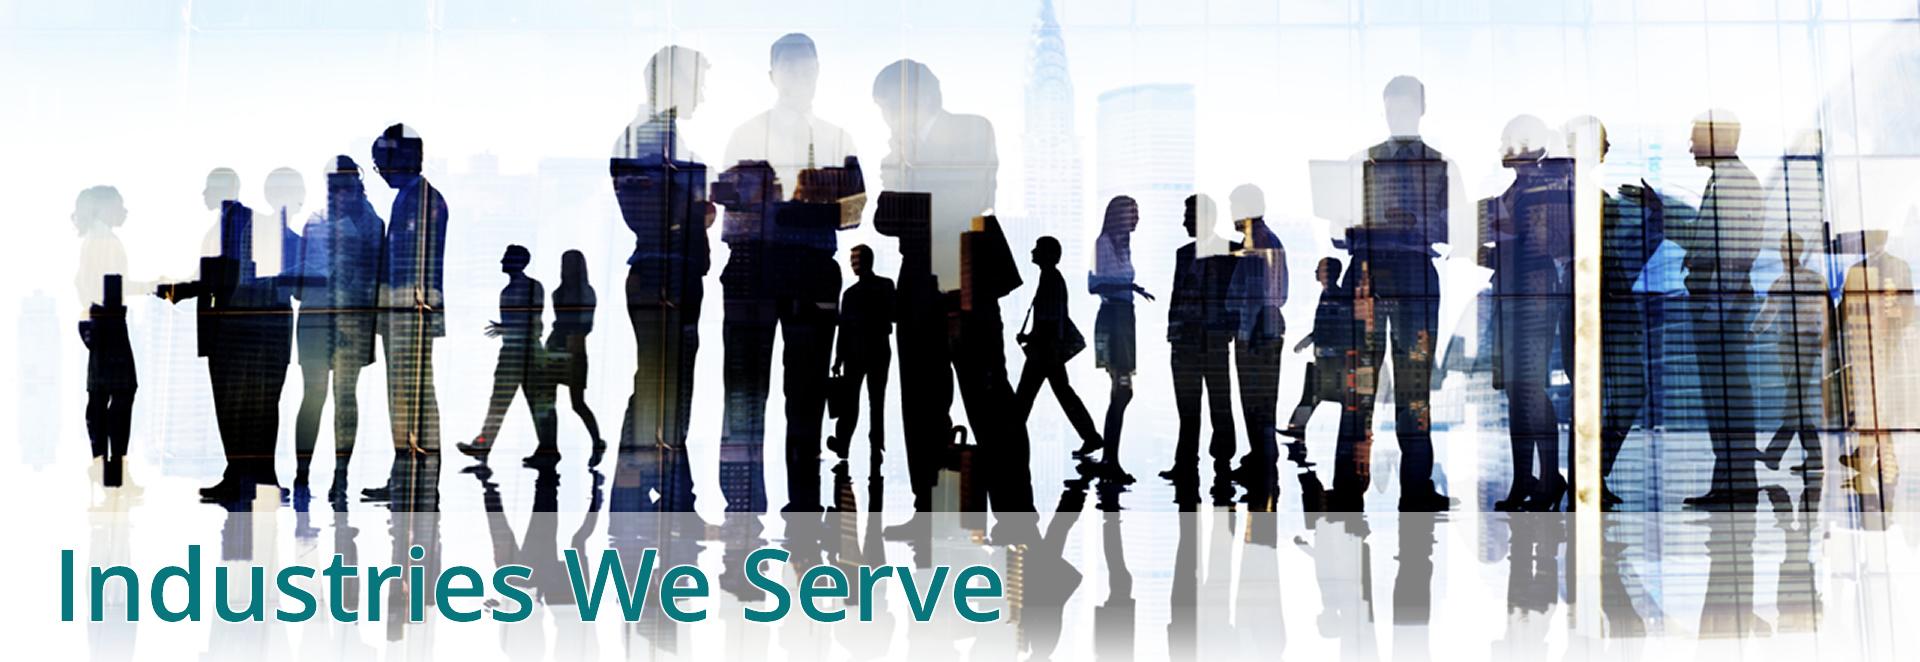 industries-We Serve Rsumes by Joyce